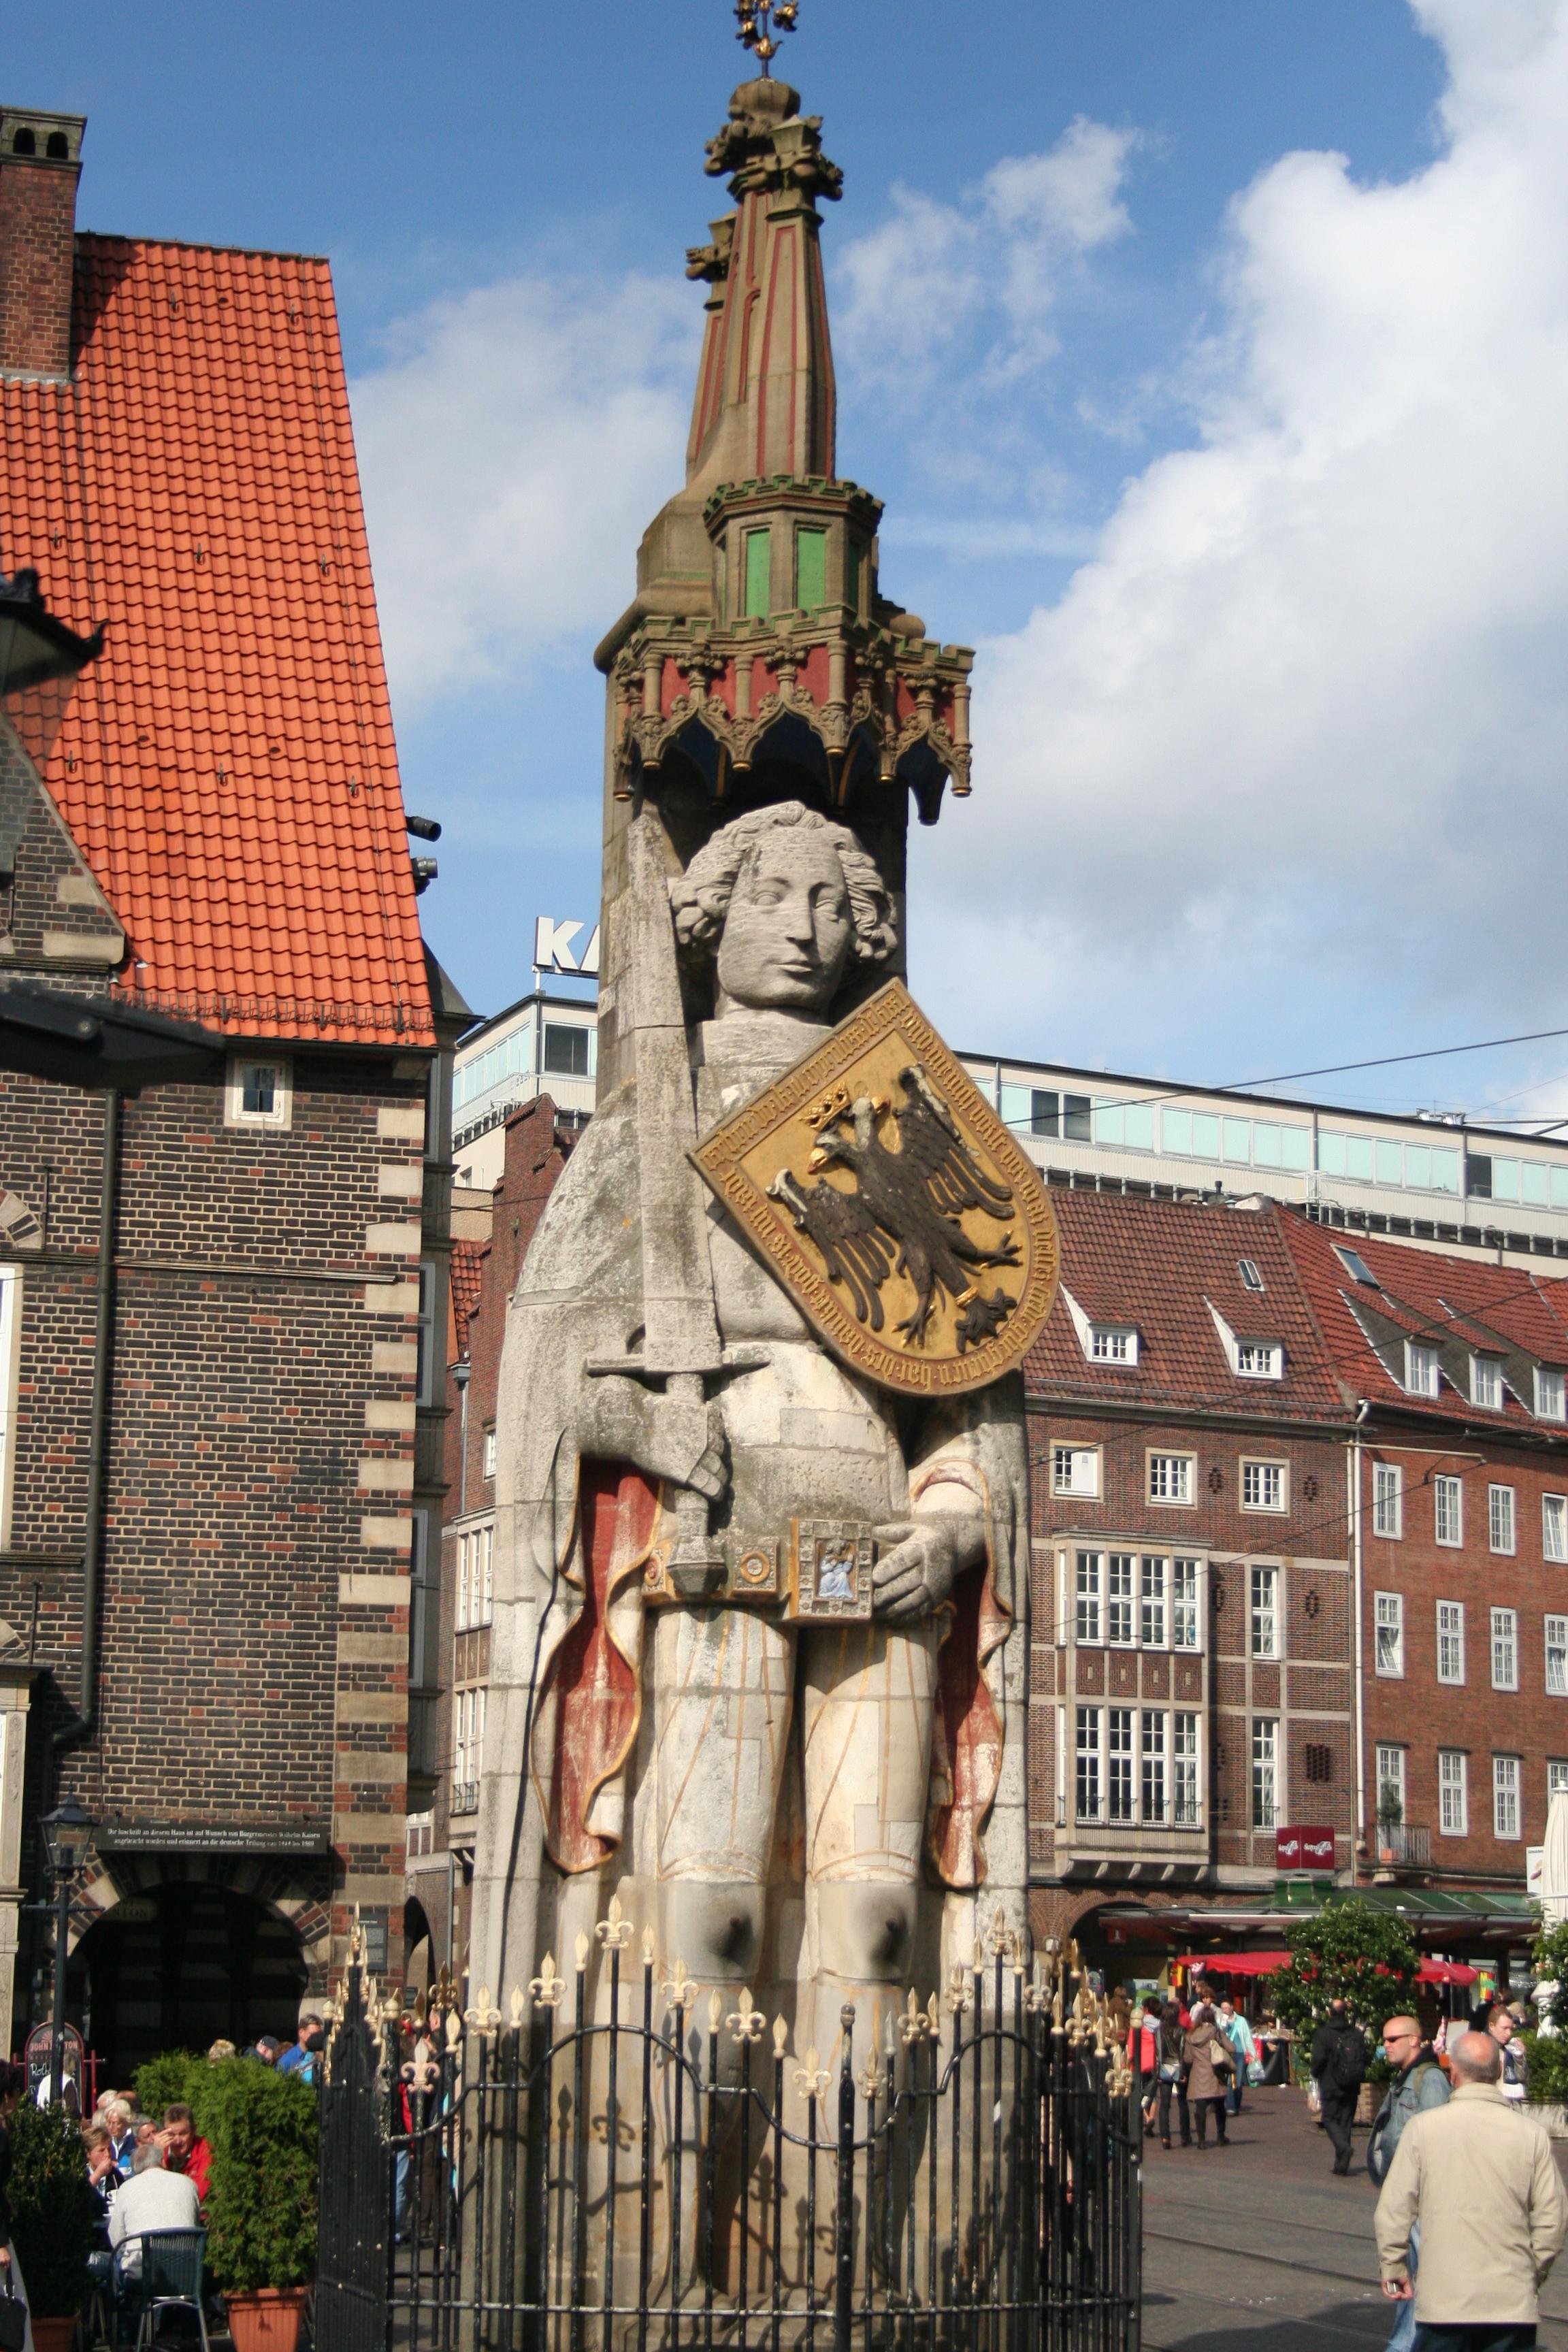 File:Roland Statue, Bremen Germany.jpg - Wikimedia Commons